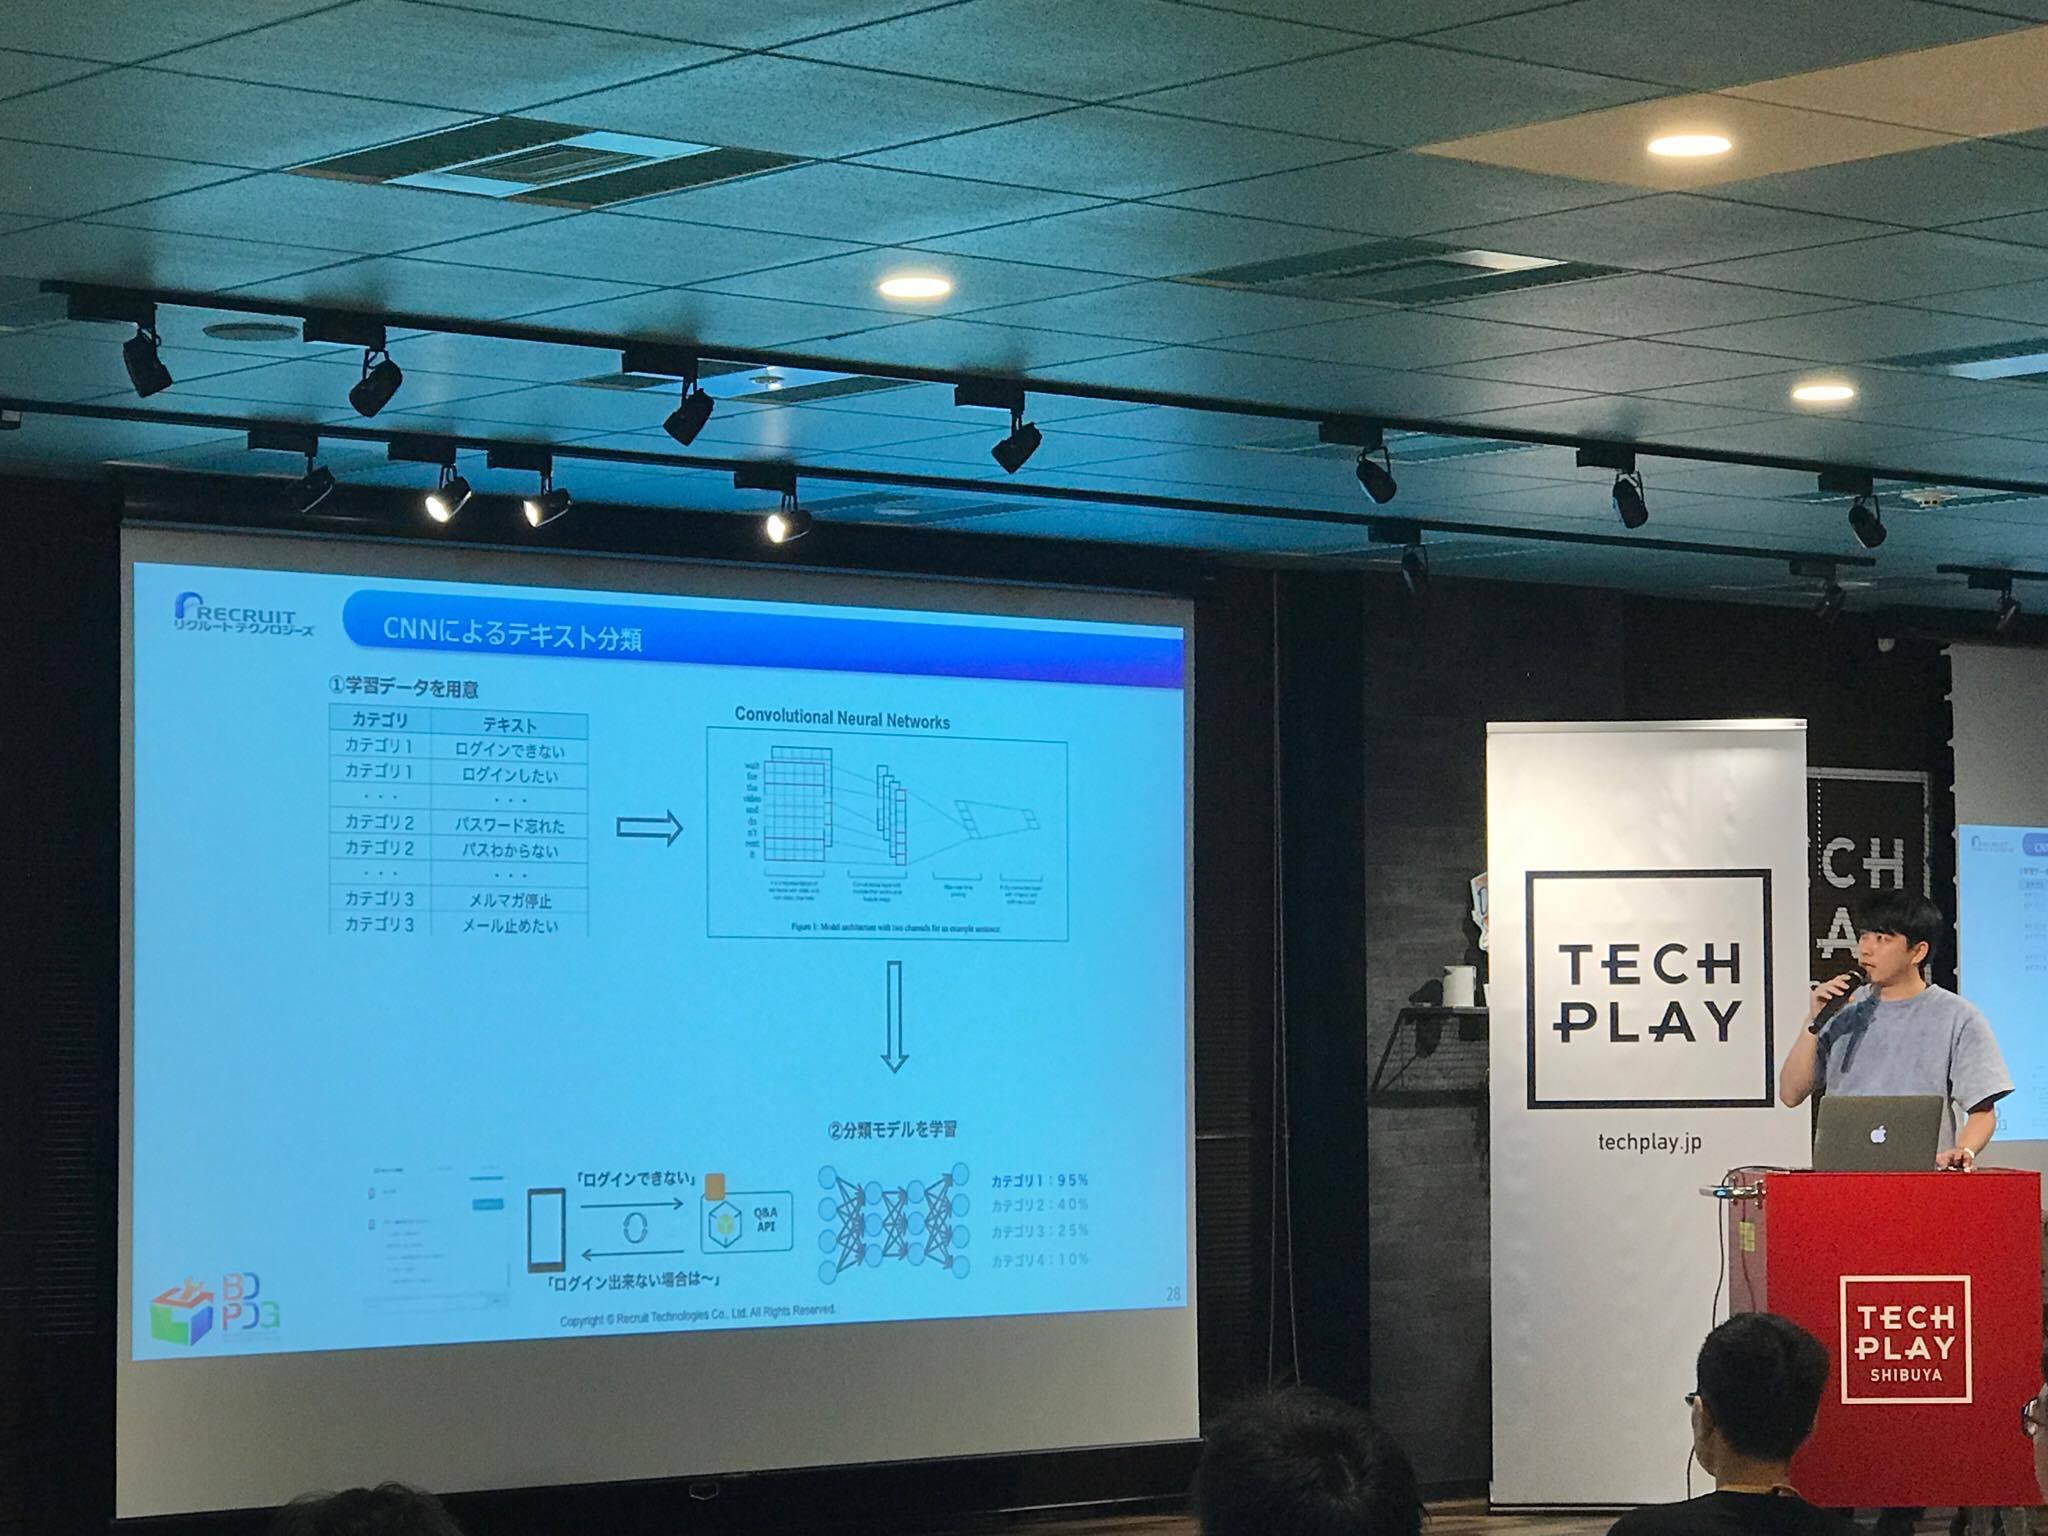 TECH PLAY CONFERENCE 2017で機械学習APIとChatbotの話をしました